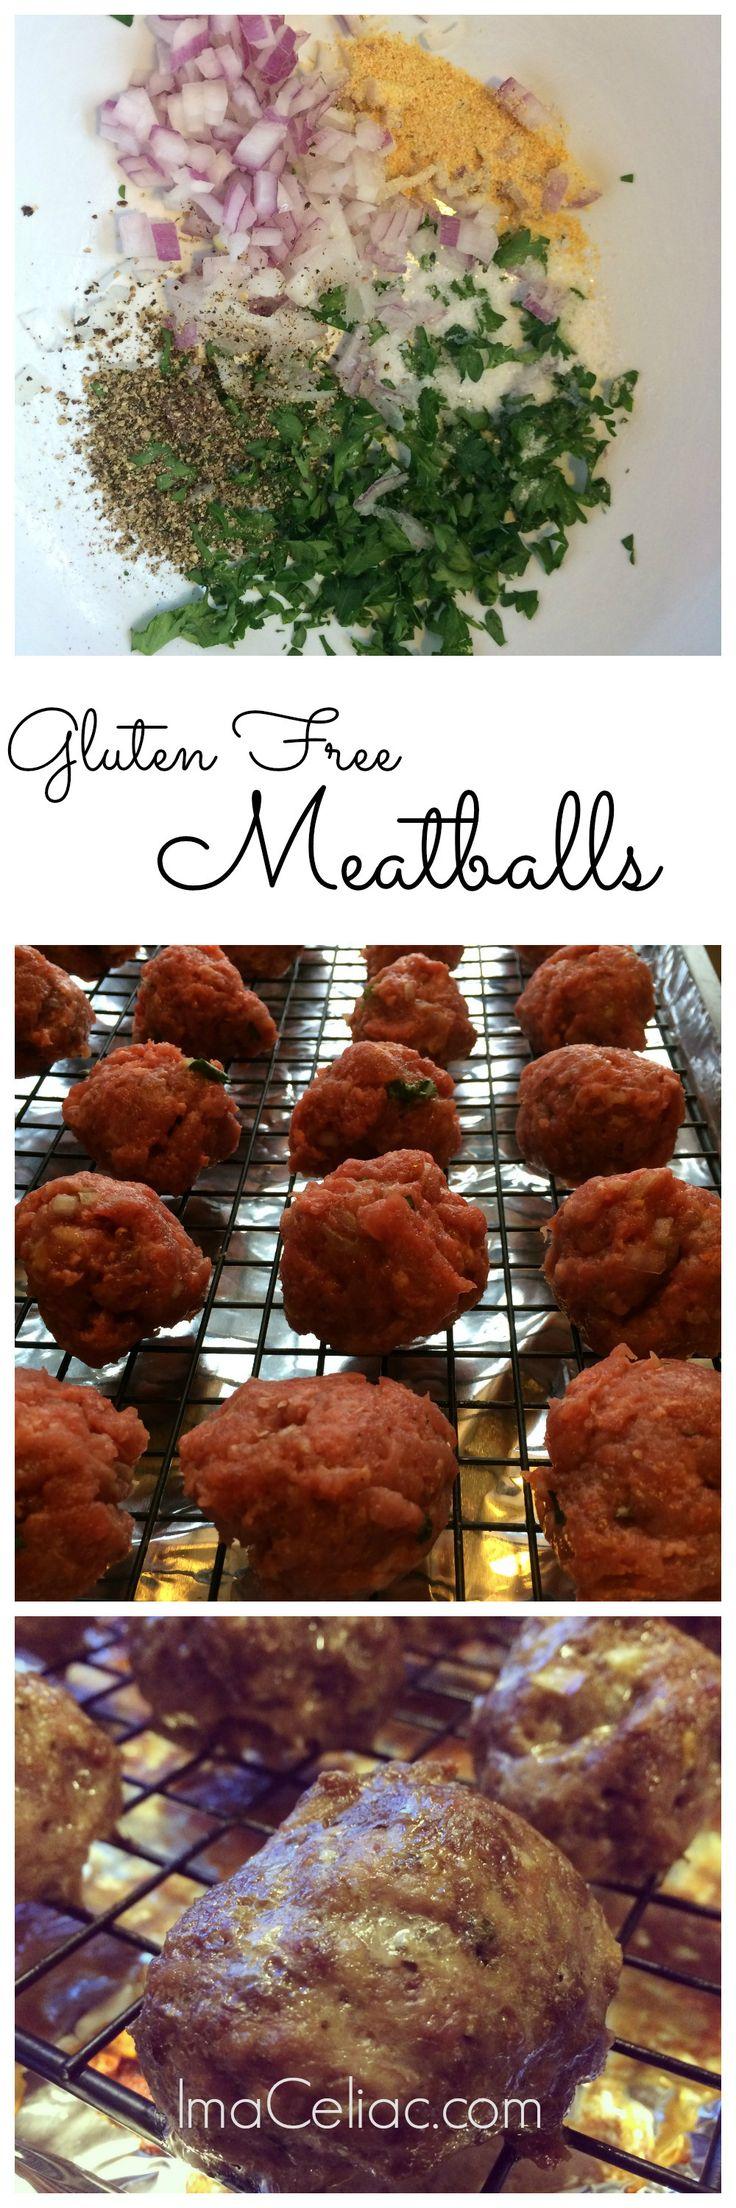 Easy Gluten Free Meatballs   iamaceliac.com